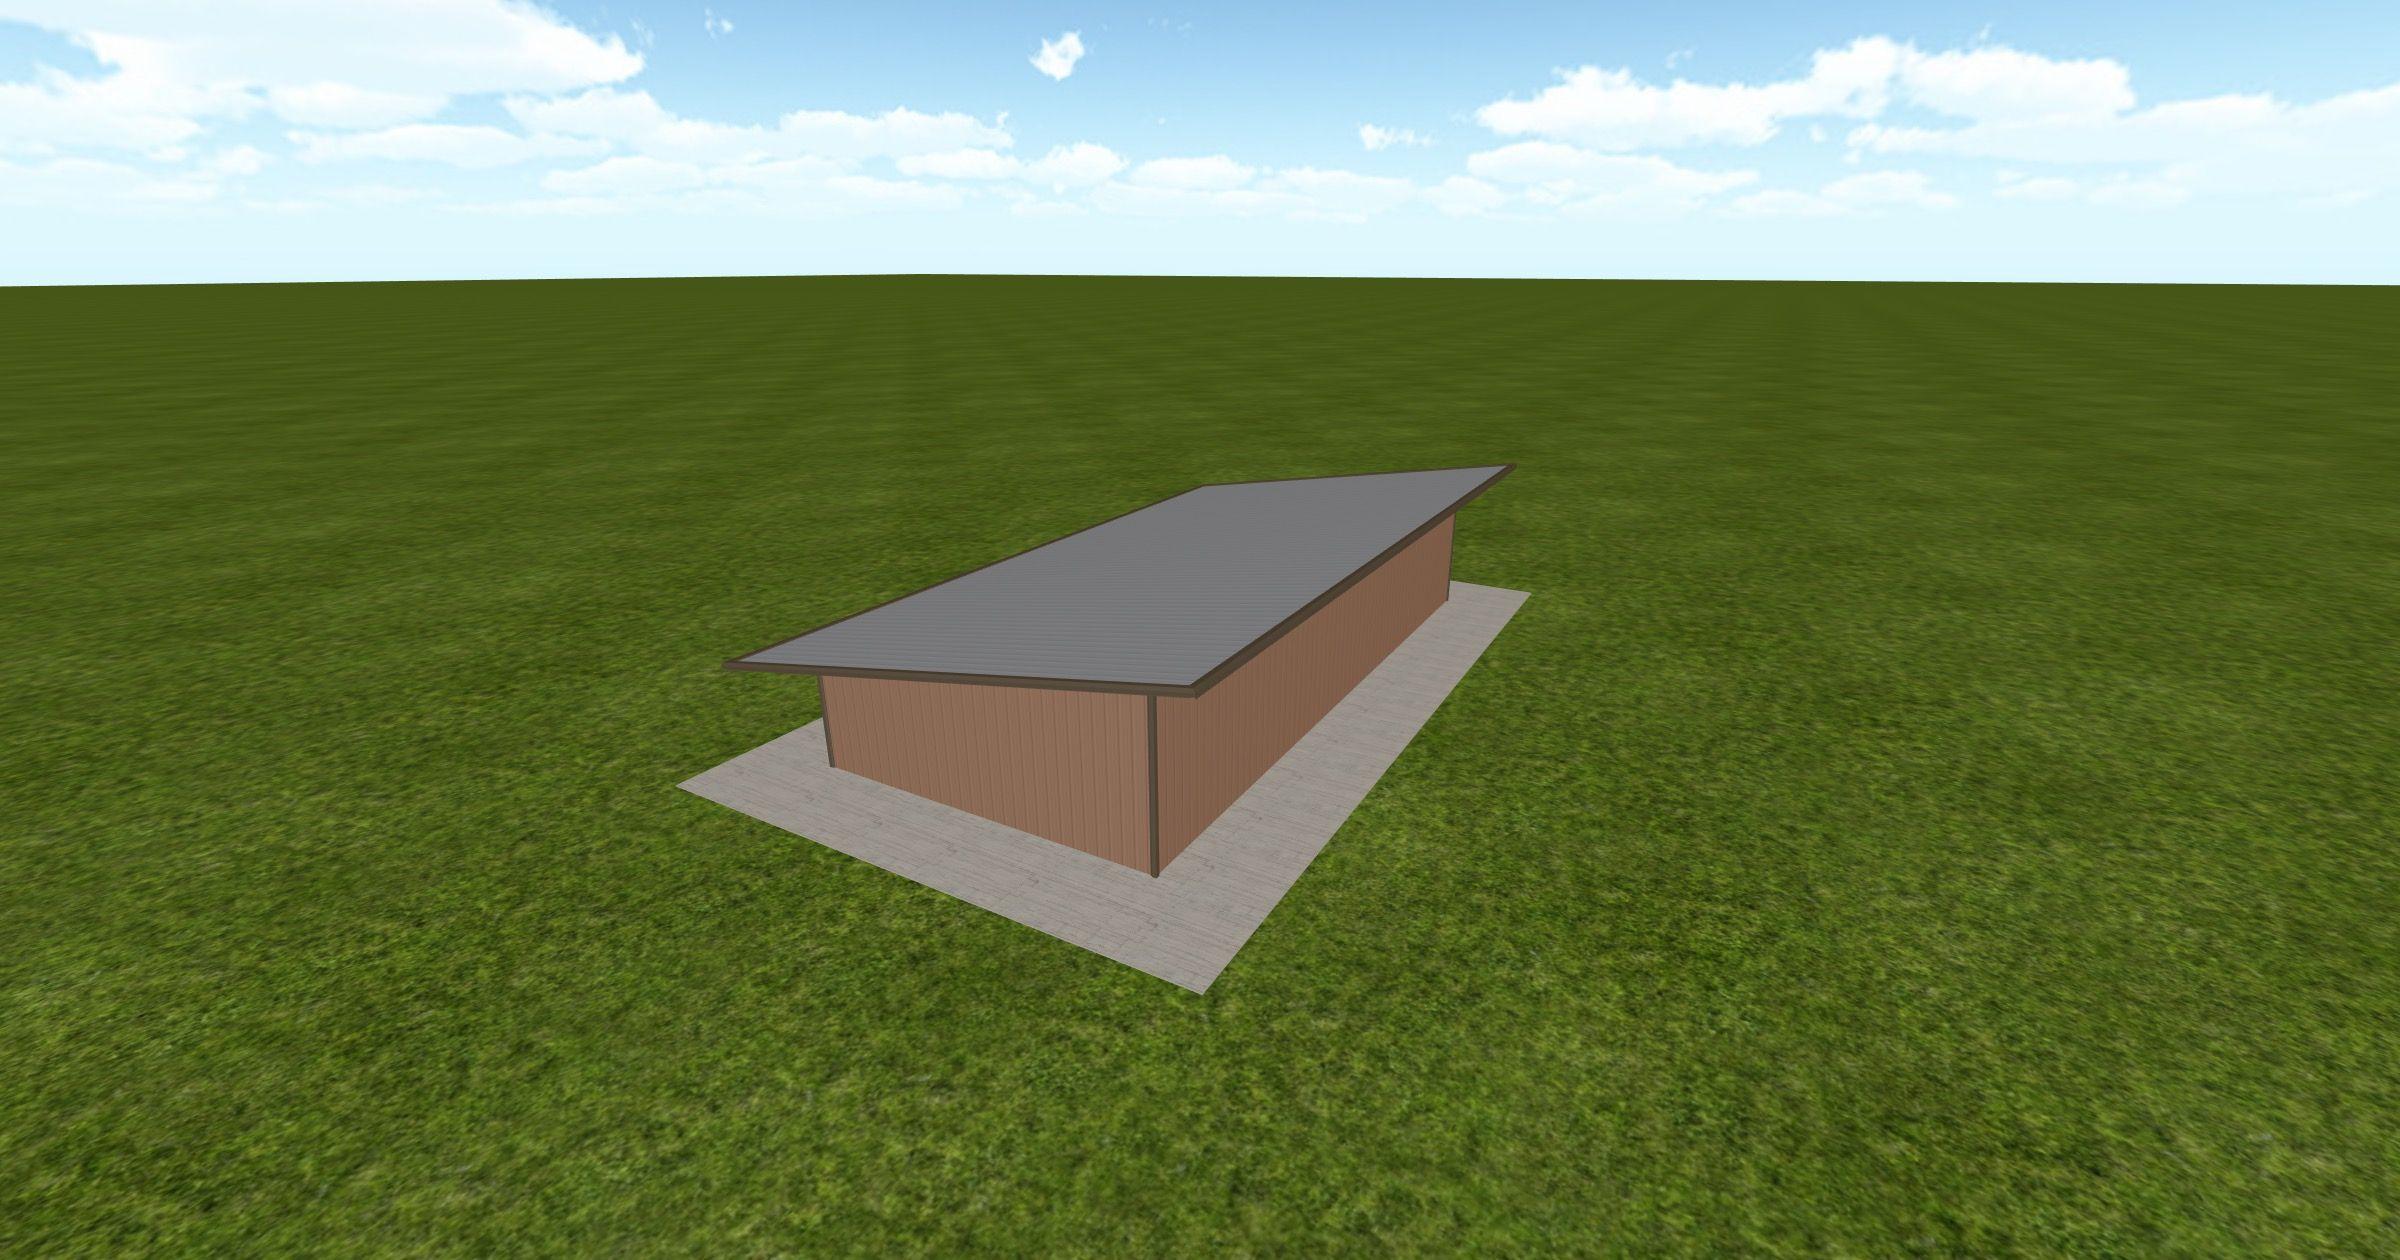 Best 15 Striking Green Roofing Model Ideas Roof Design 400 x 300